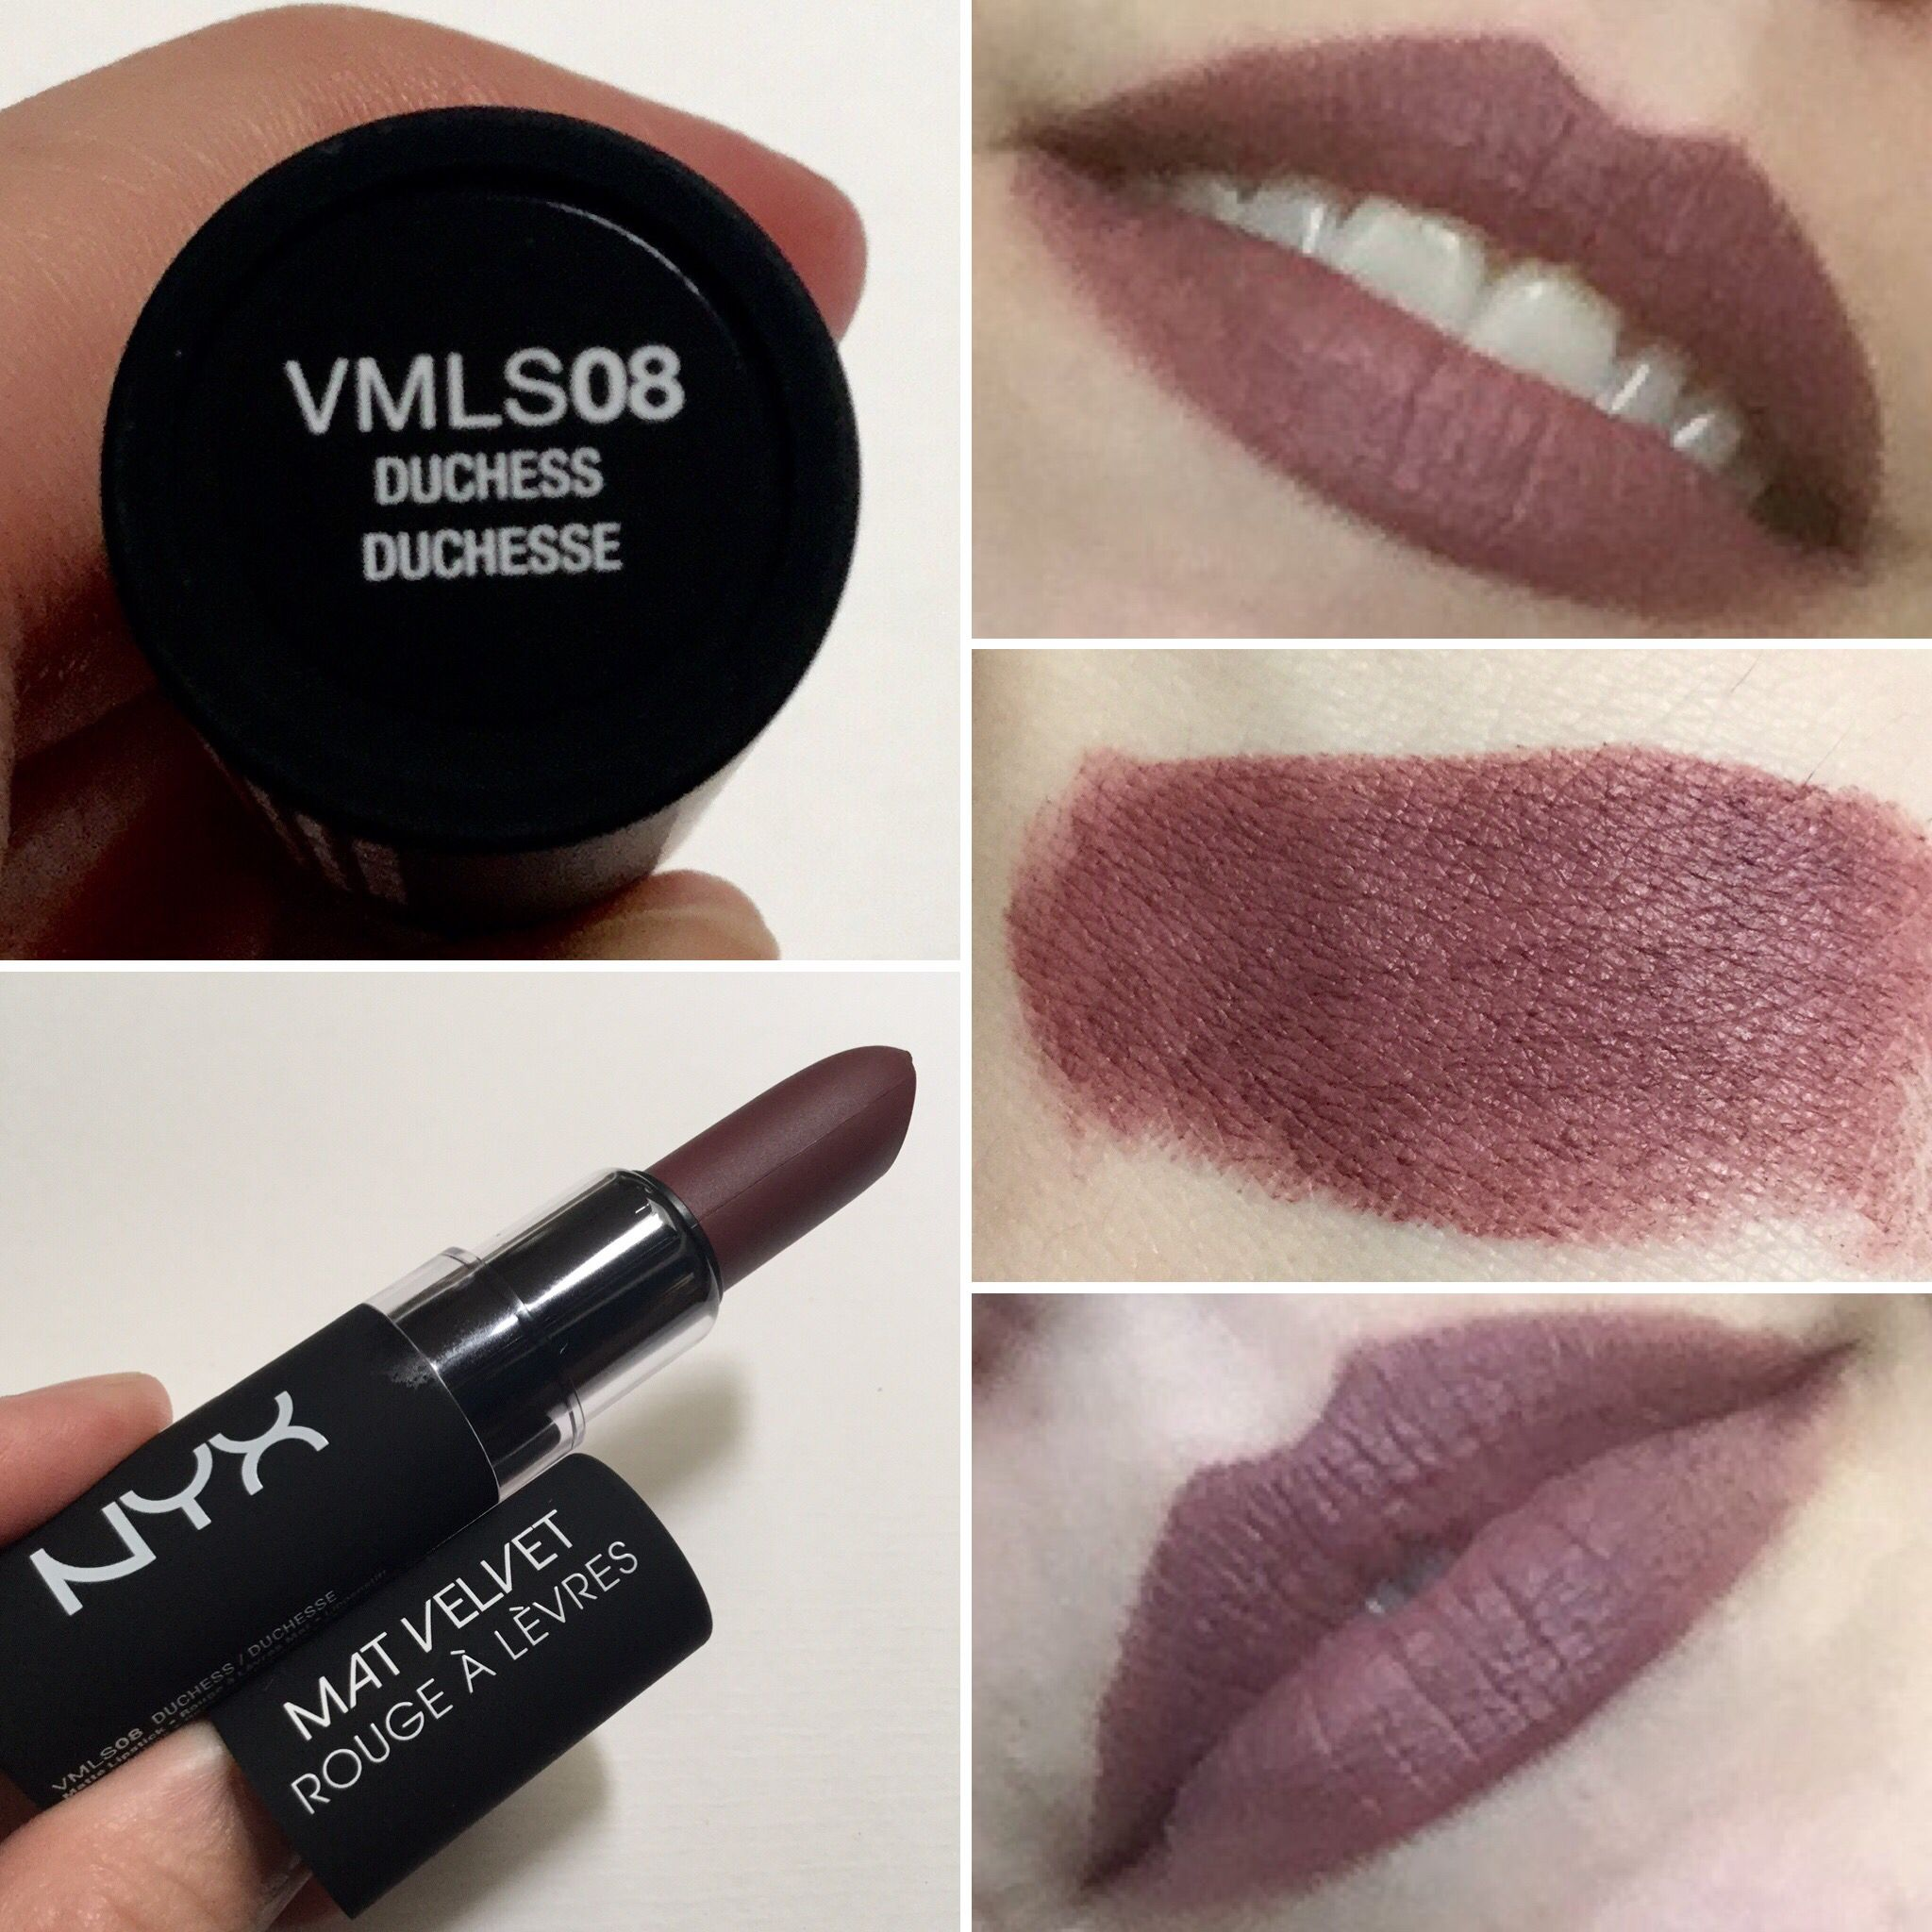 Nyx Velvet Matte Lipstick In Duchess A Beautiful Dark